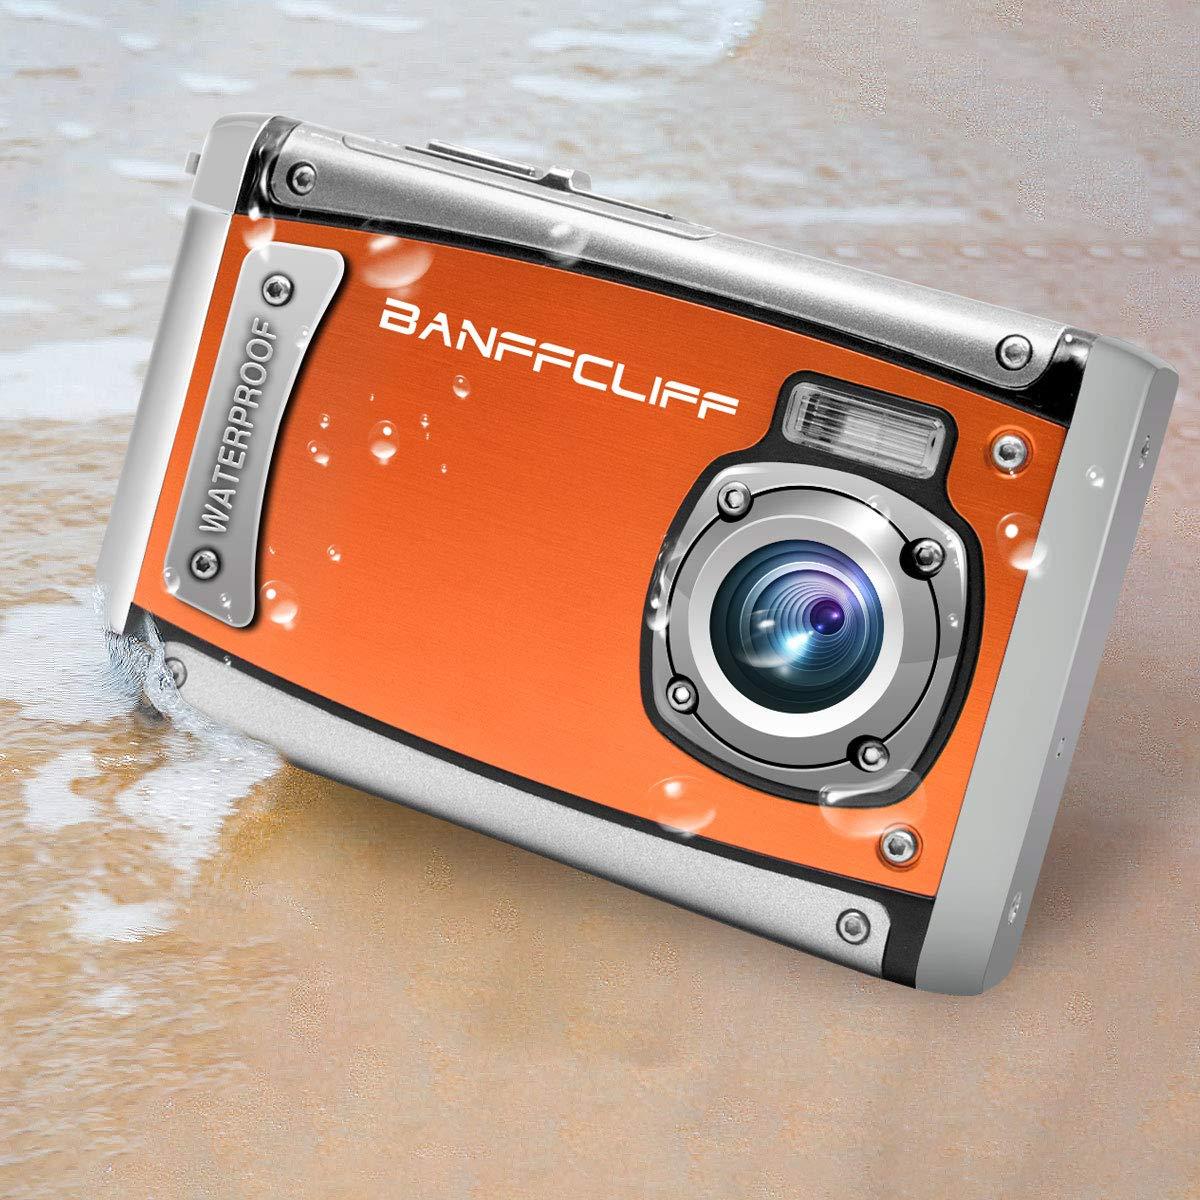 BanffCliff 21MP 1080P HD Waterproof Digital Camera, Anti-Shock 3 Meter Underwater Action Cam, 2.4' LCD Screen Flash Mic IP68 Camcorder 8X Digital Zoom Water Sports Video Recorder X21